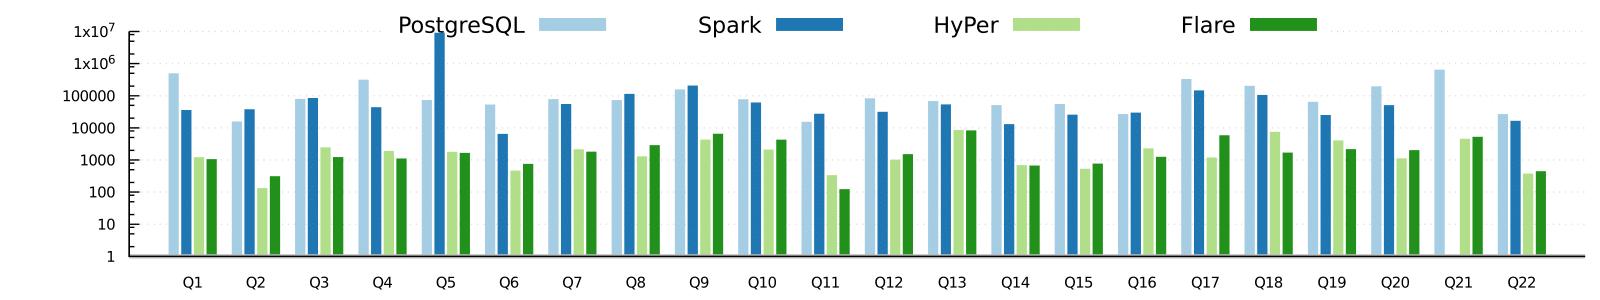 Flare - An Accelerator for Apache Spark